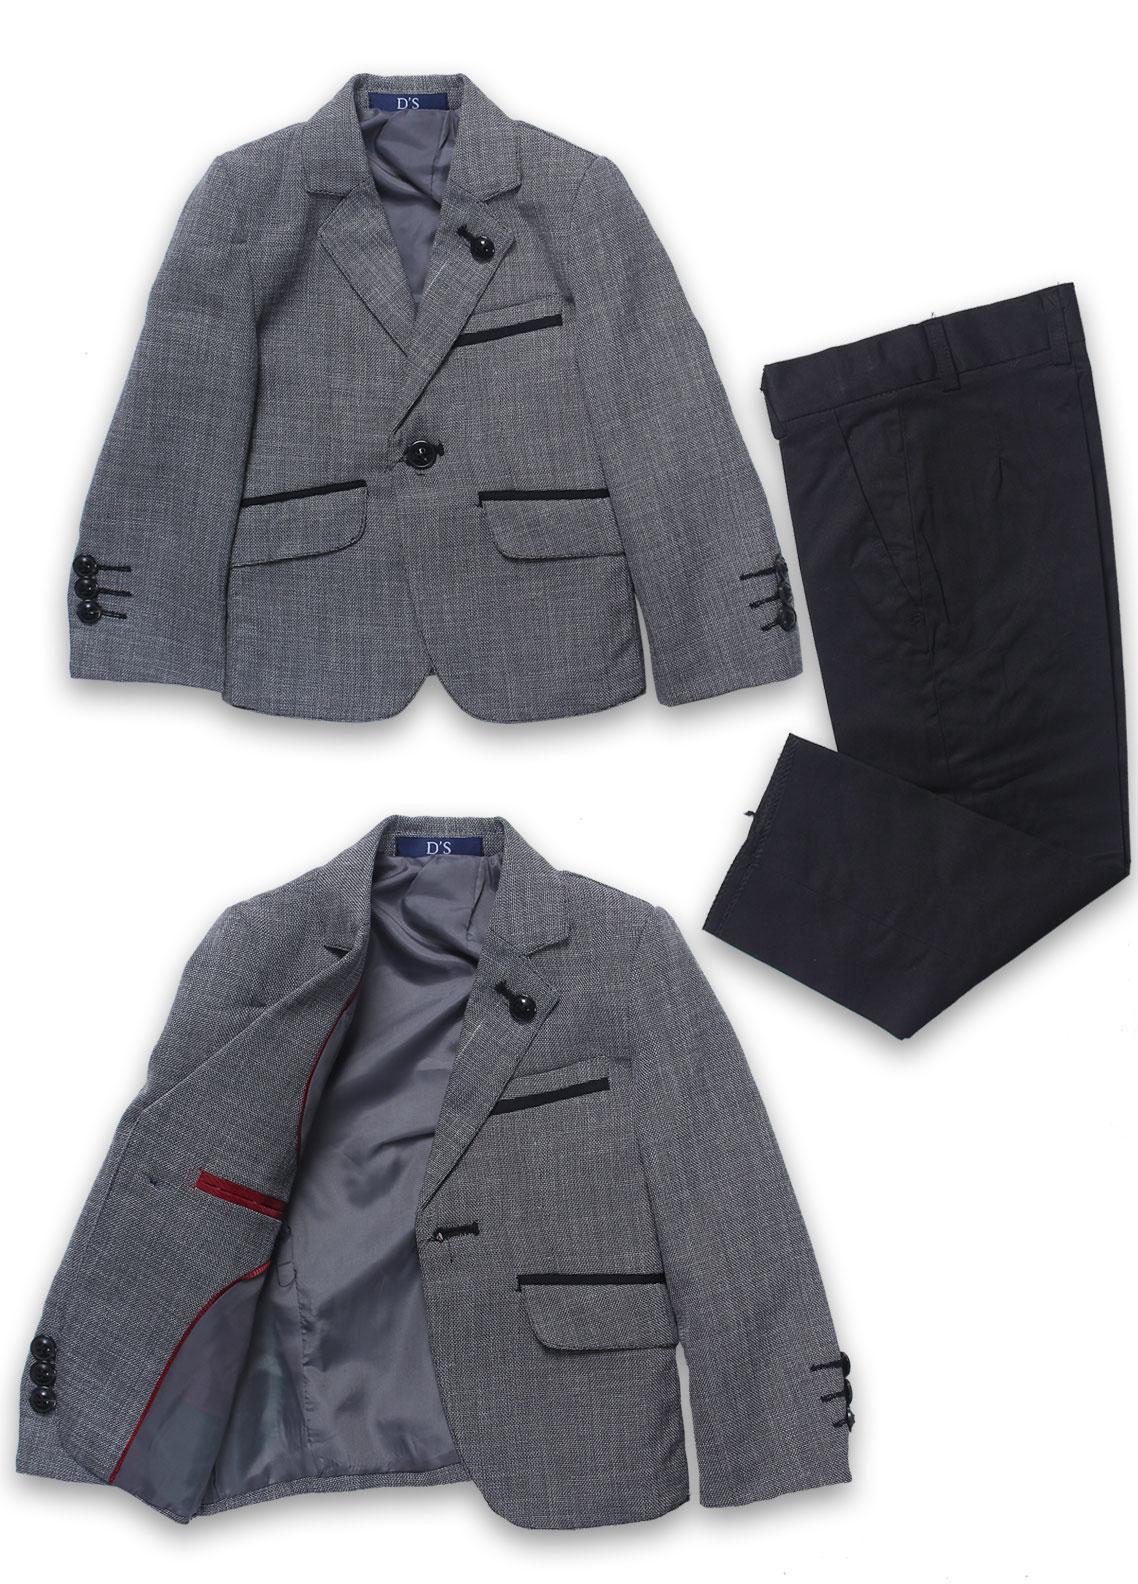 Sanaulla Exclusive Range Cotton Formal Coat Suit for Boys -  1001 Grey